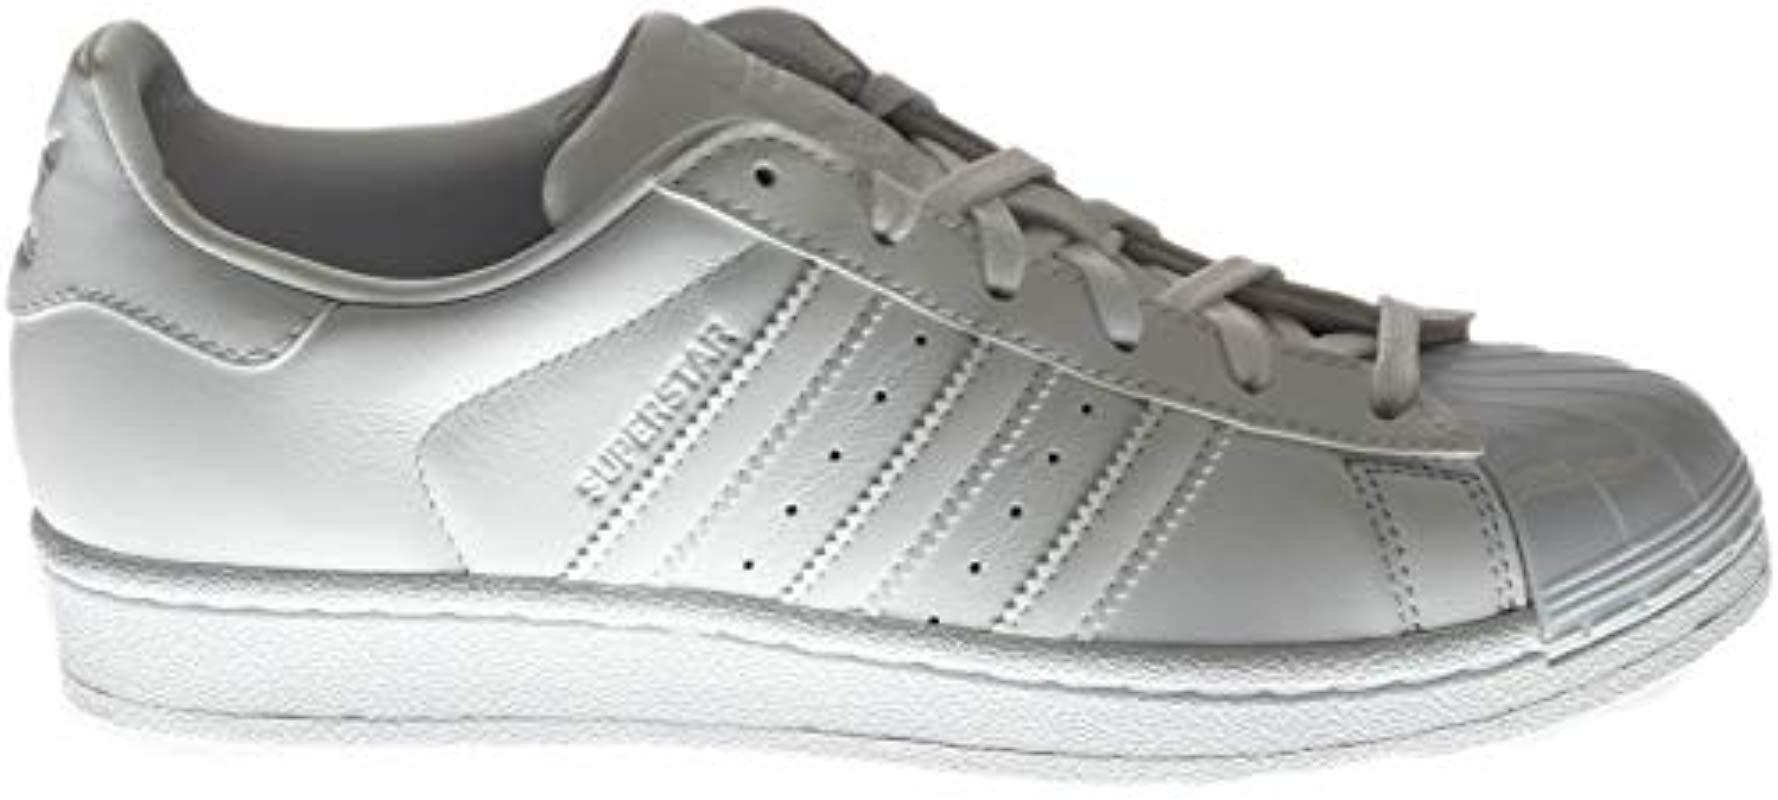 6a169194dcd Lyst - adidas Originals Superstar Glossy Toe Fashion Running Shoe in ...